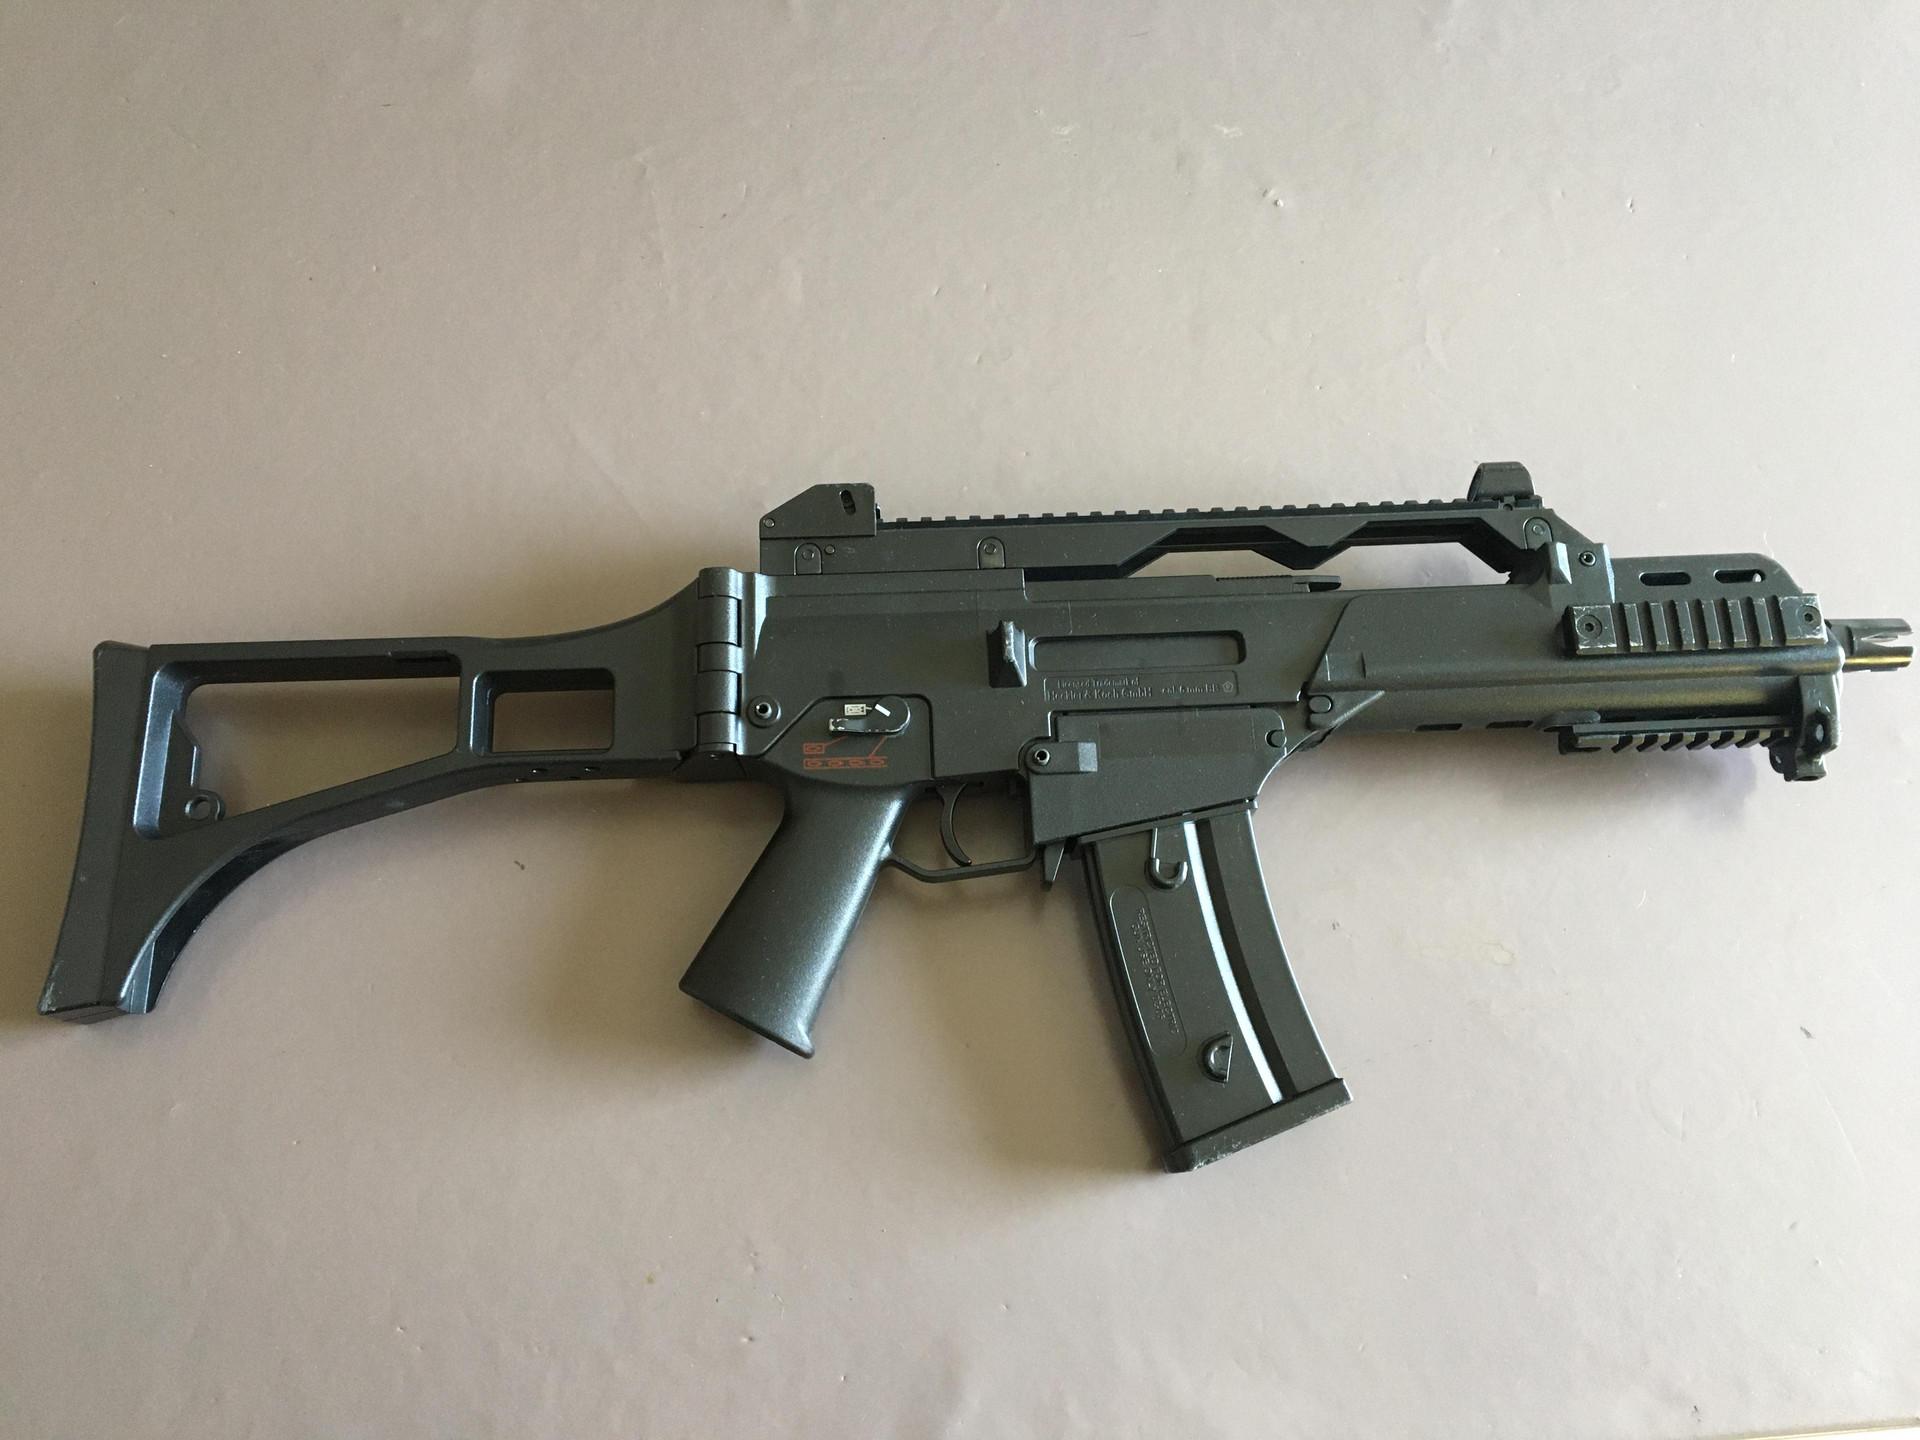 HK G36 C